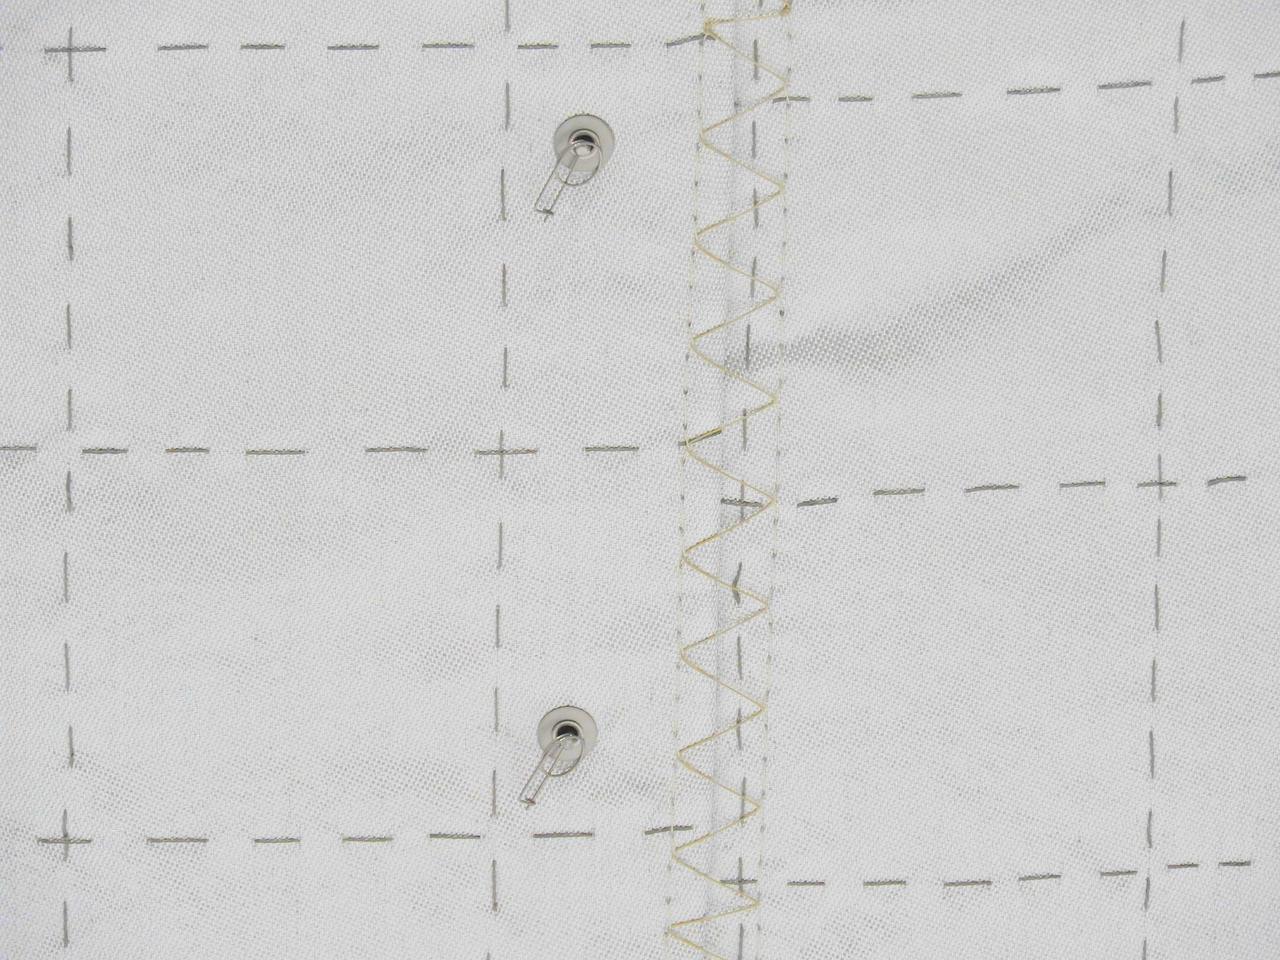 1567213890568-BepiColombo_Detail_of_MPO_insulation_blanket_1280.jpg